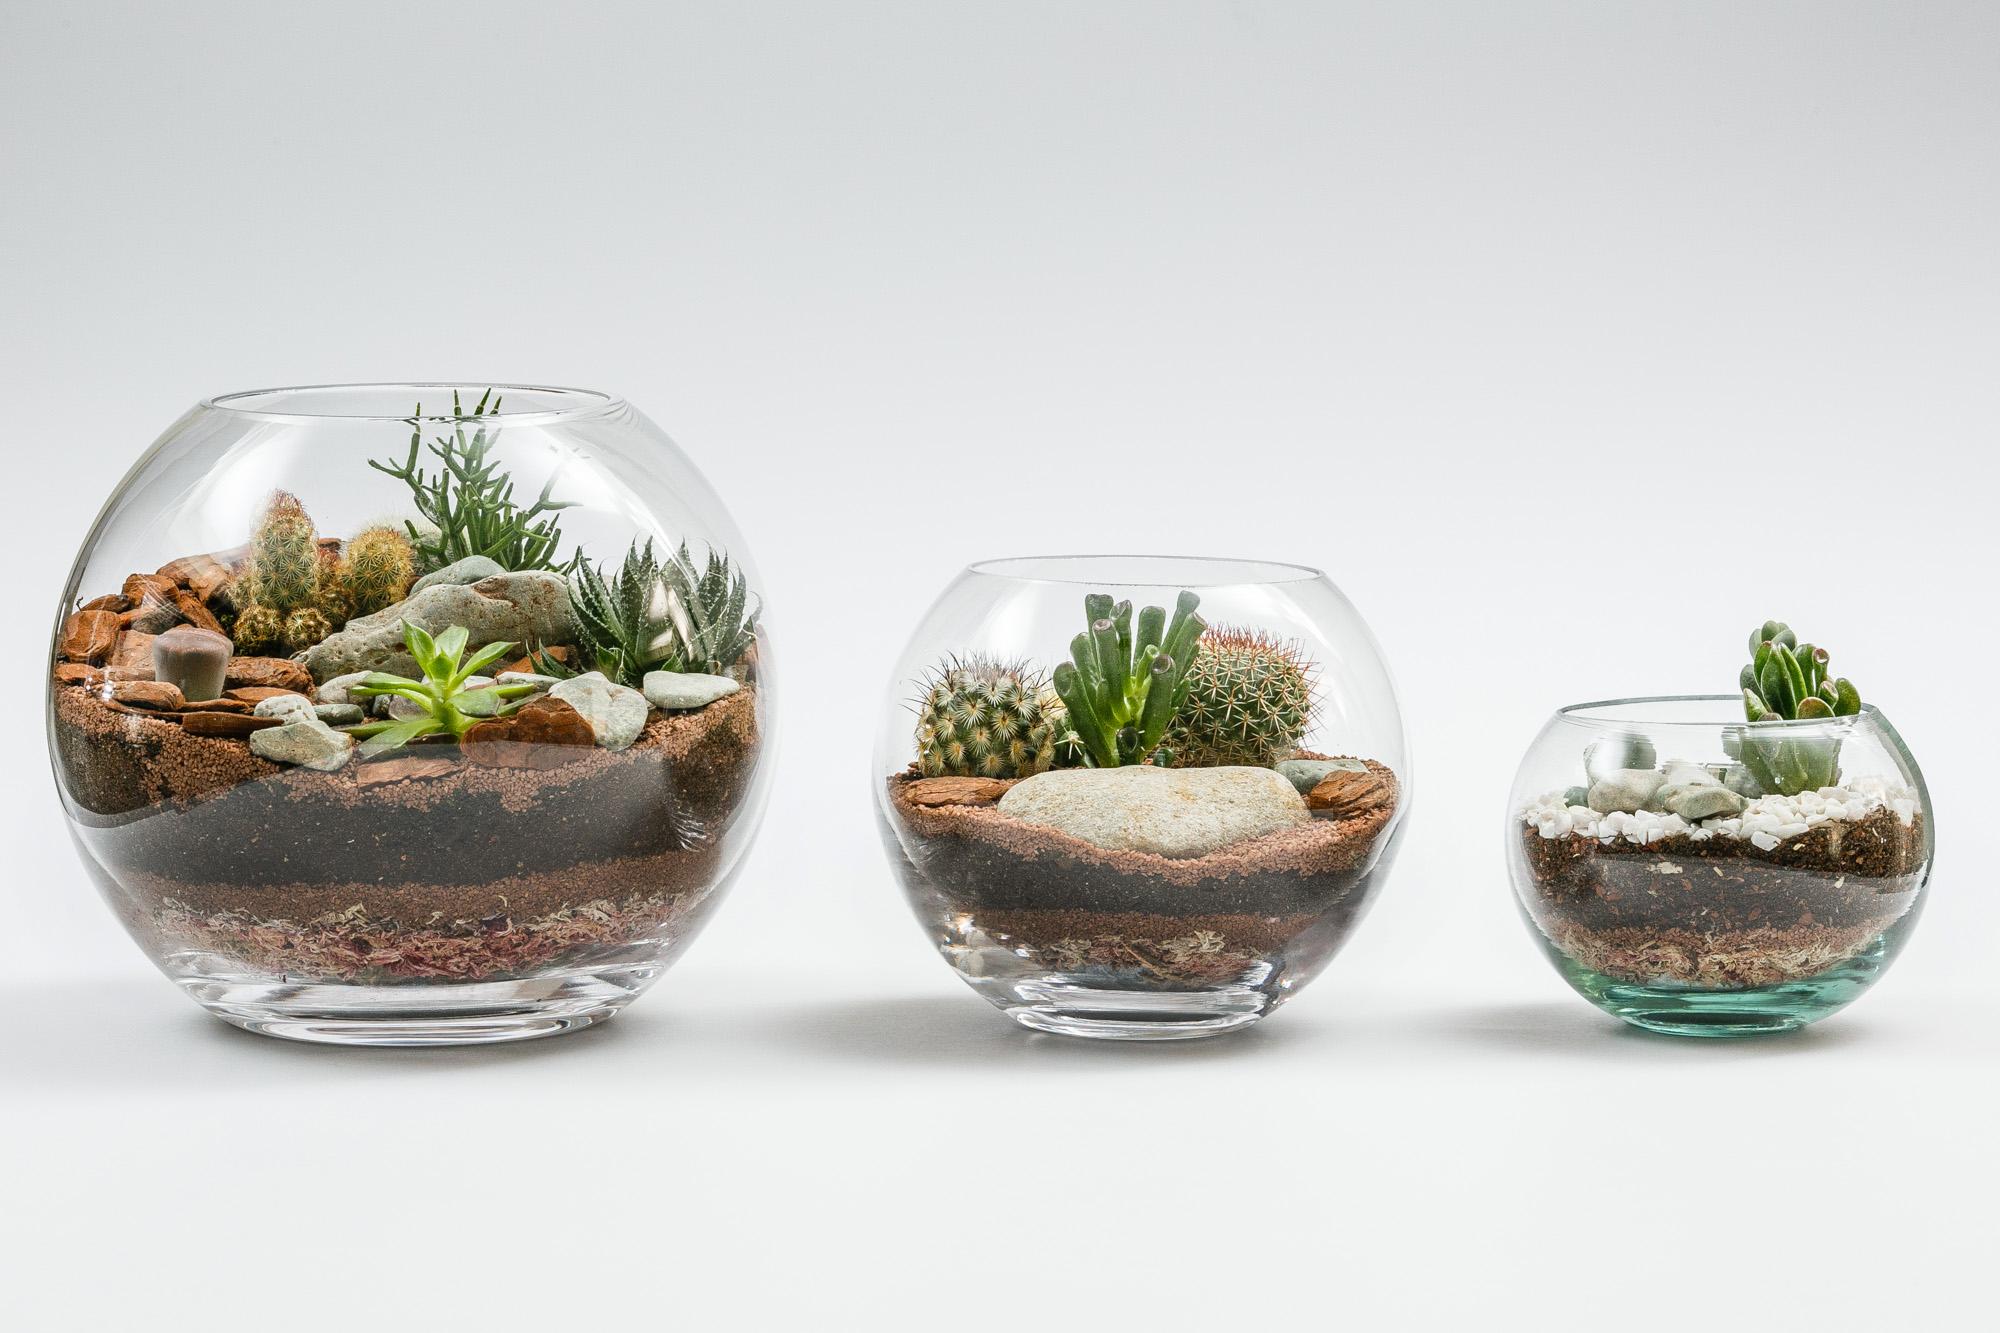 Foto de Produto - Vasos de Plantas